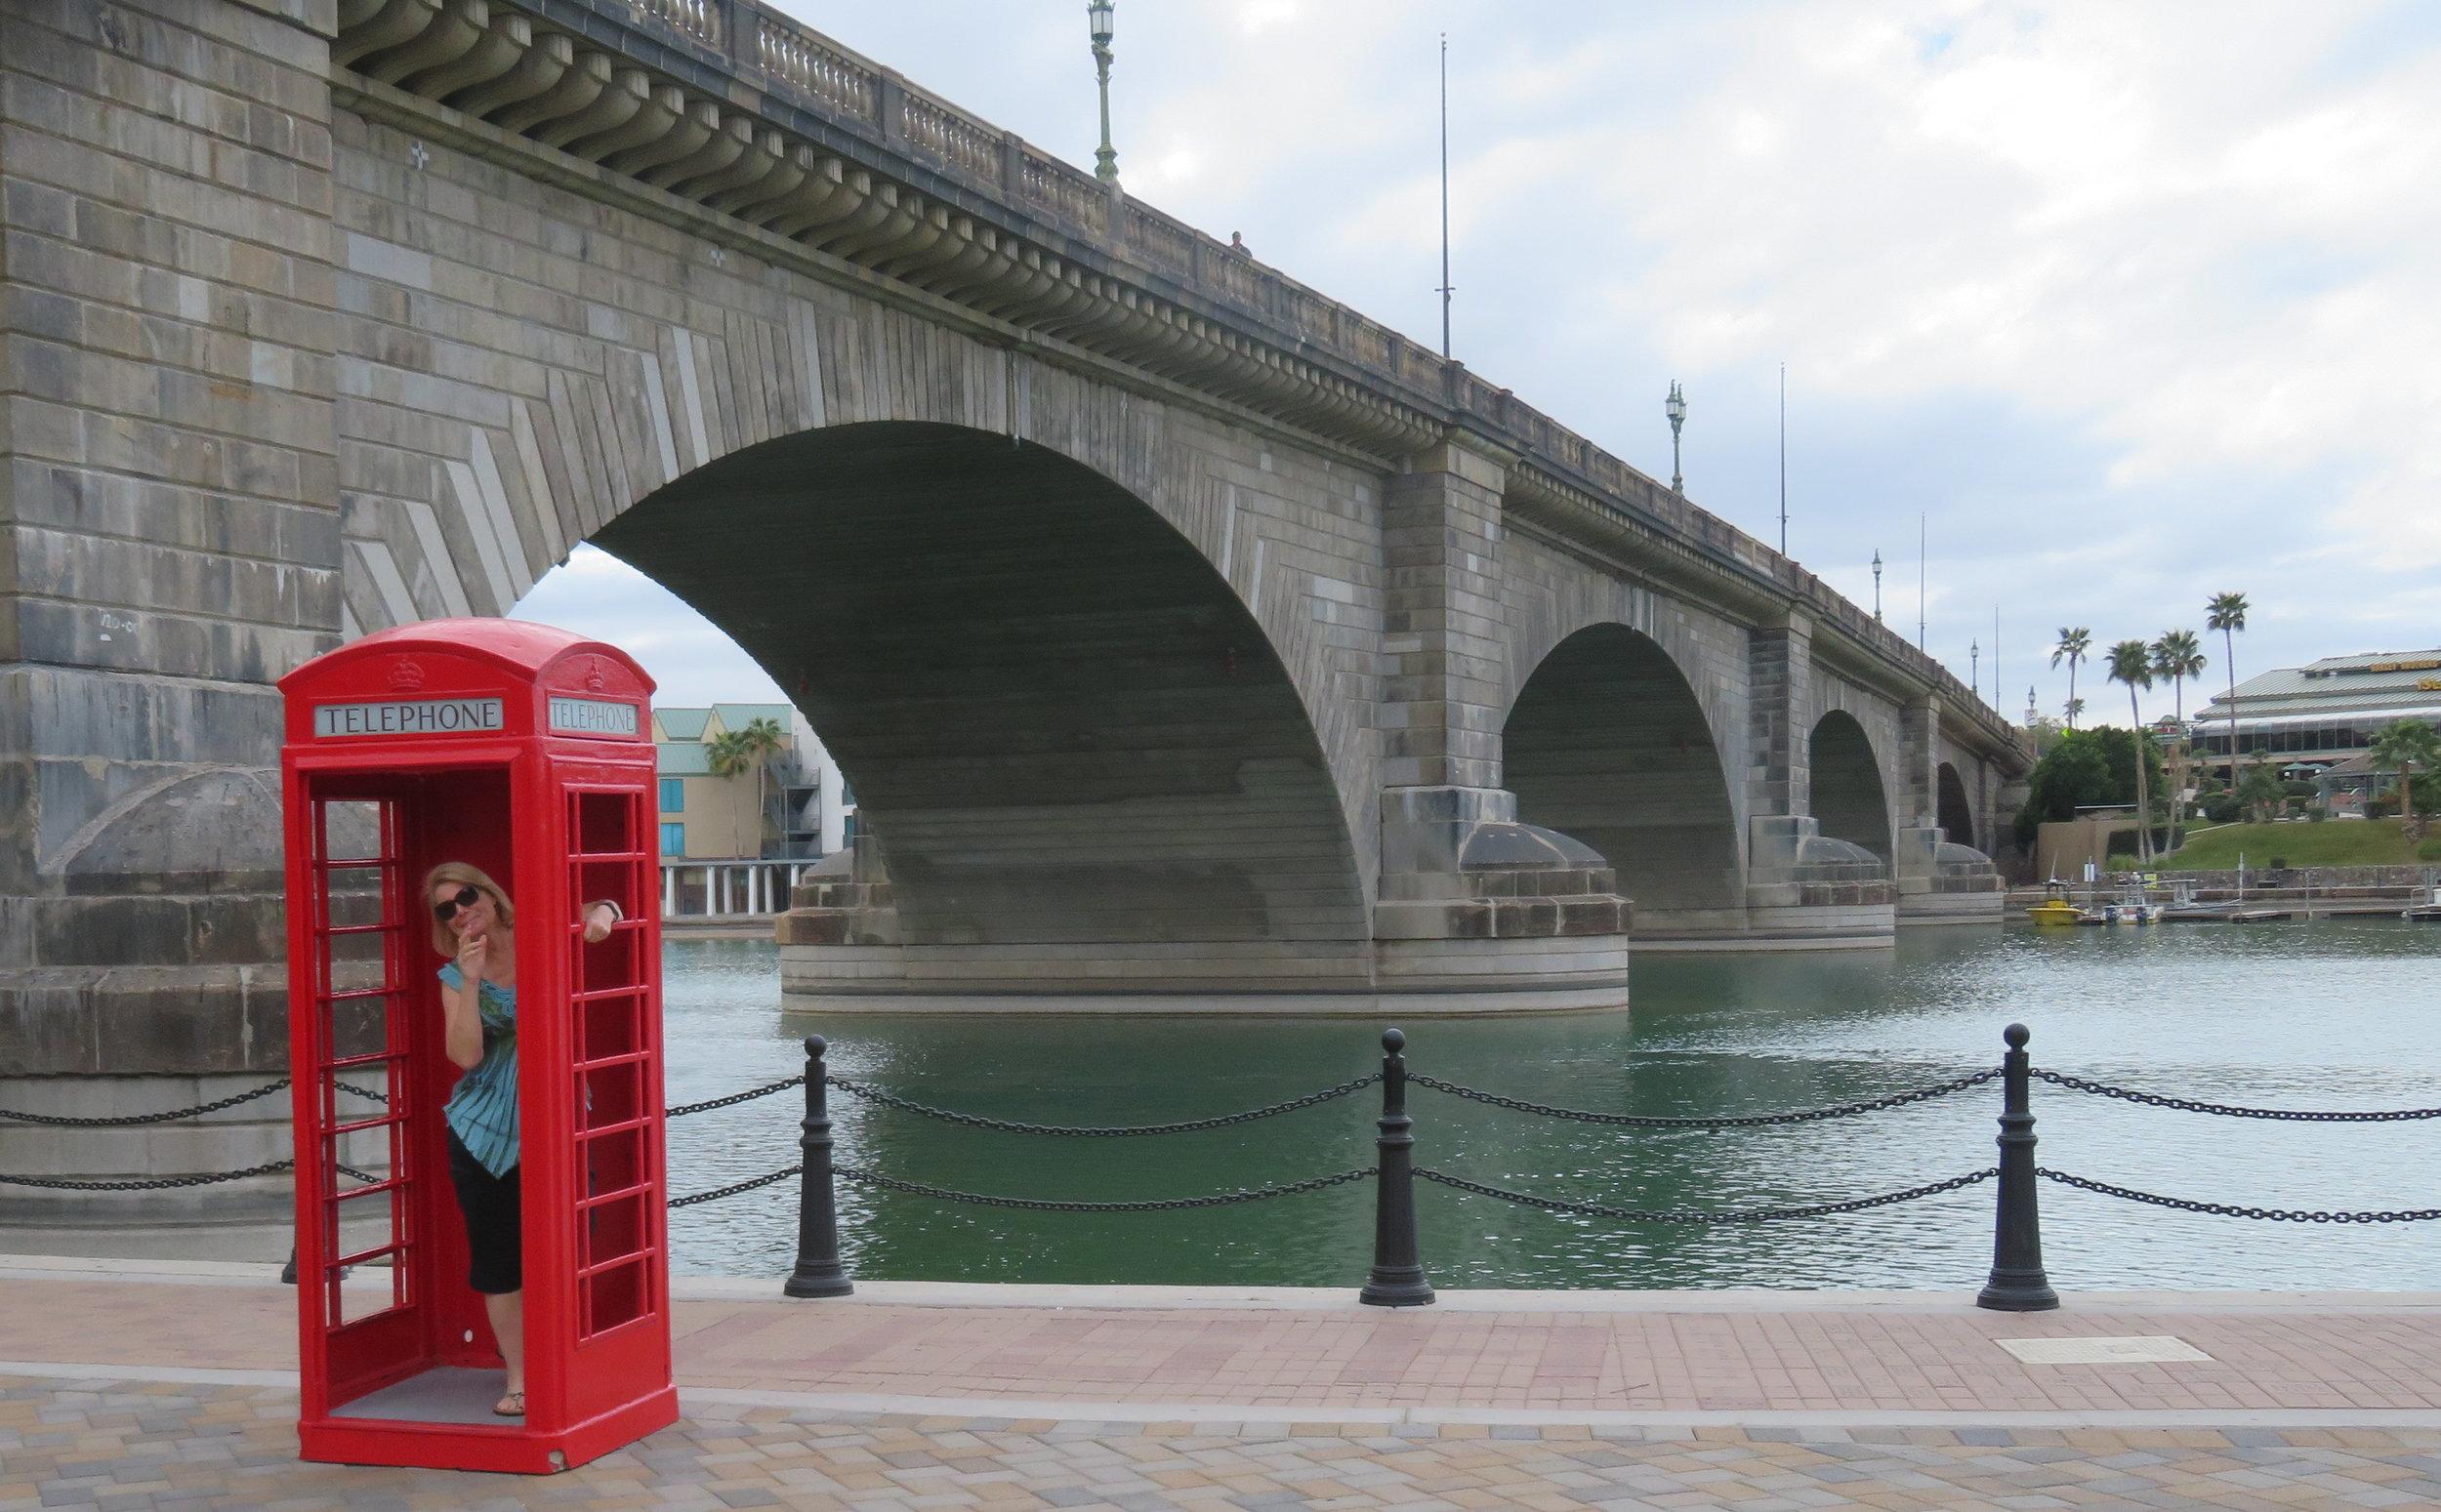 A quick stop in Lake Havasu City to view London Bridge.This one ain't fallin' down.